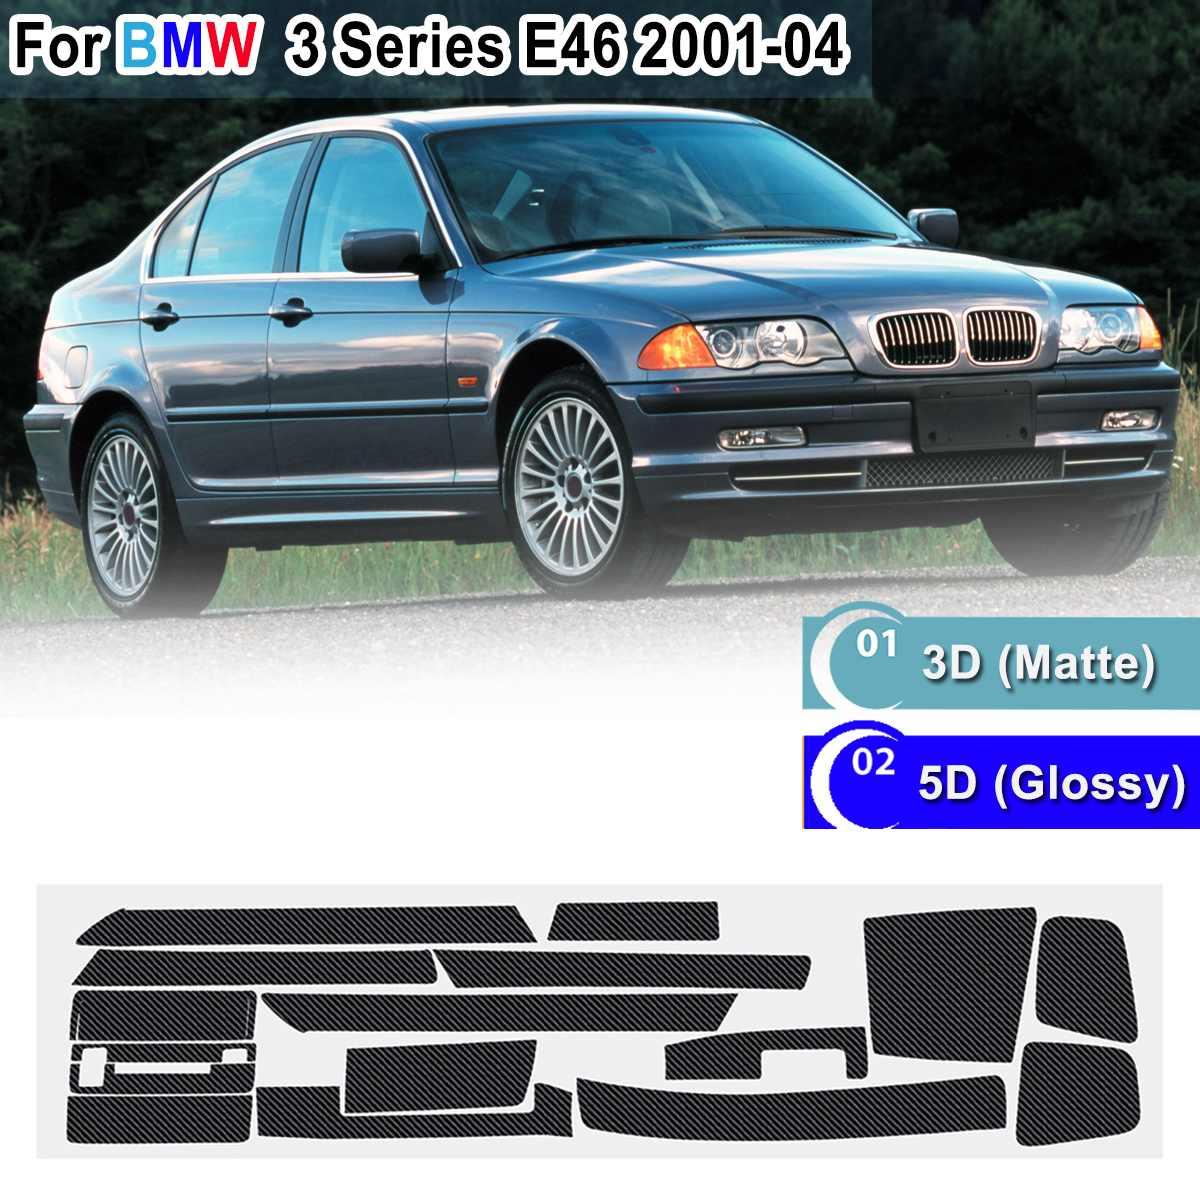 18pcs RHD 5D Glossy/ 3D Matte Carbon Fiber Pattern Interior Sticker Vinyl Decal Trim For BMW 3 Series E46 2001-2004